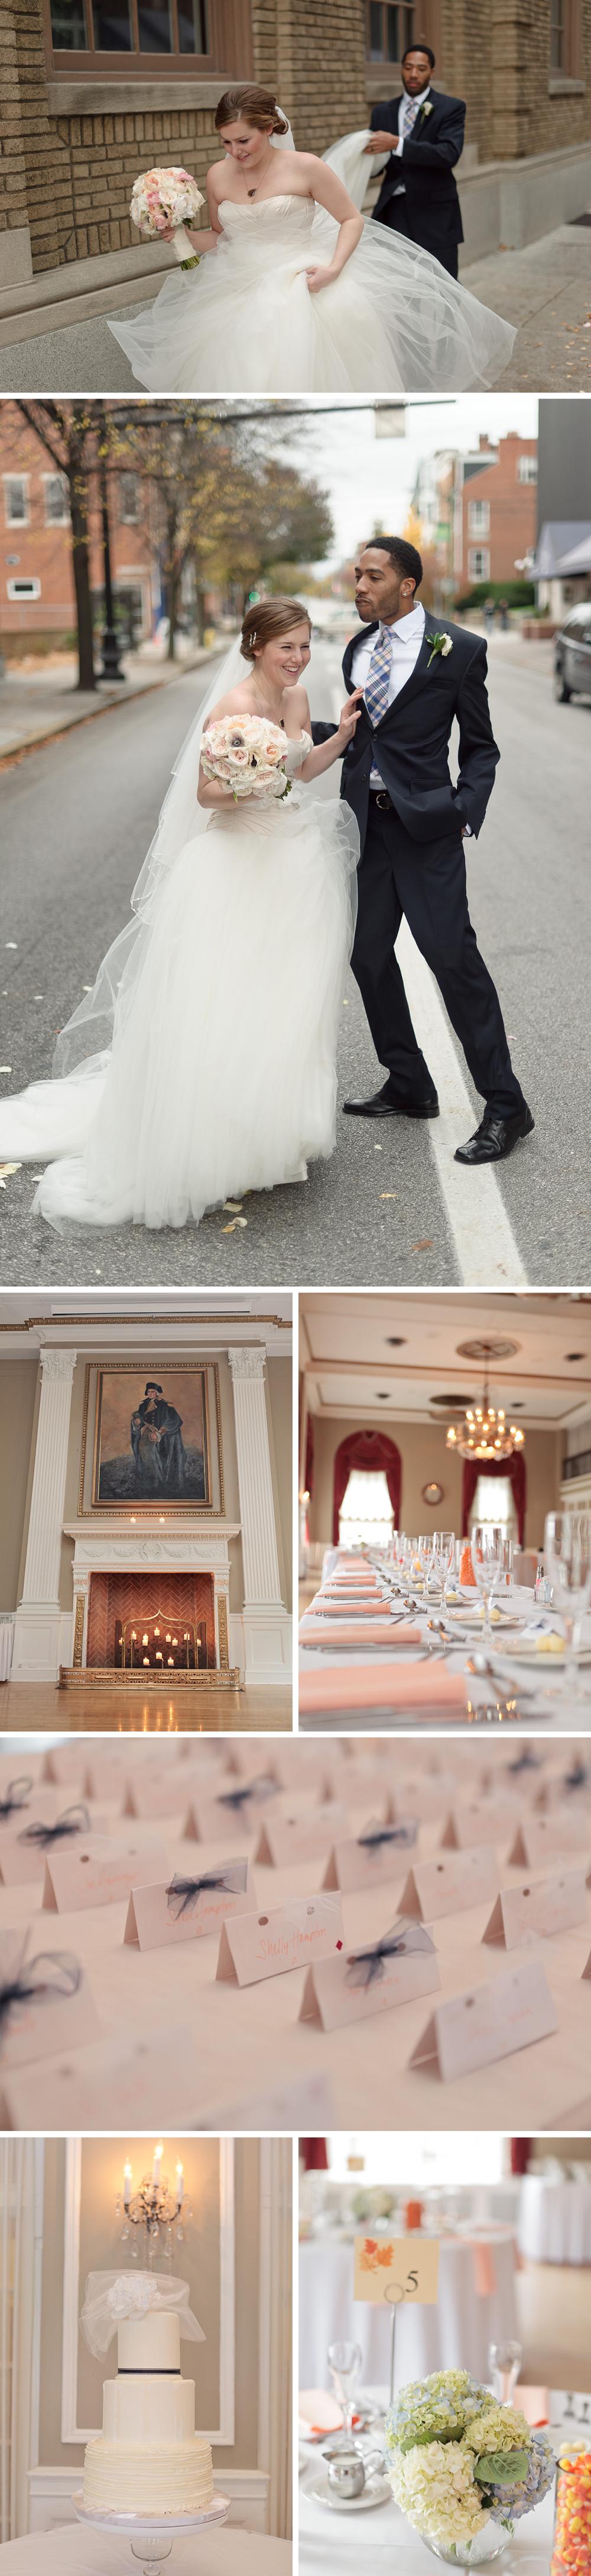 Yorktowne Hotel Wedding photography